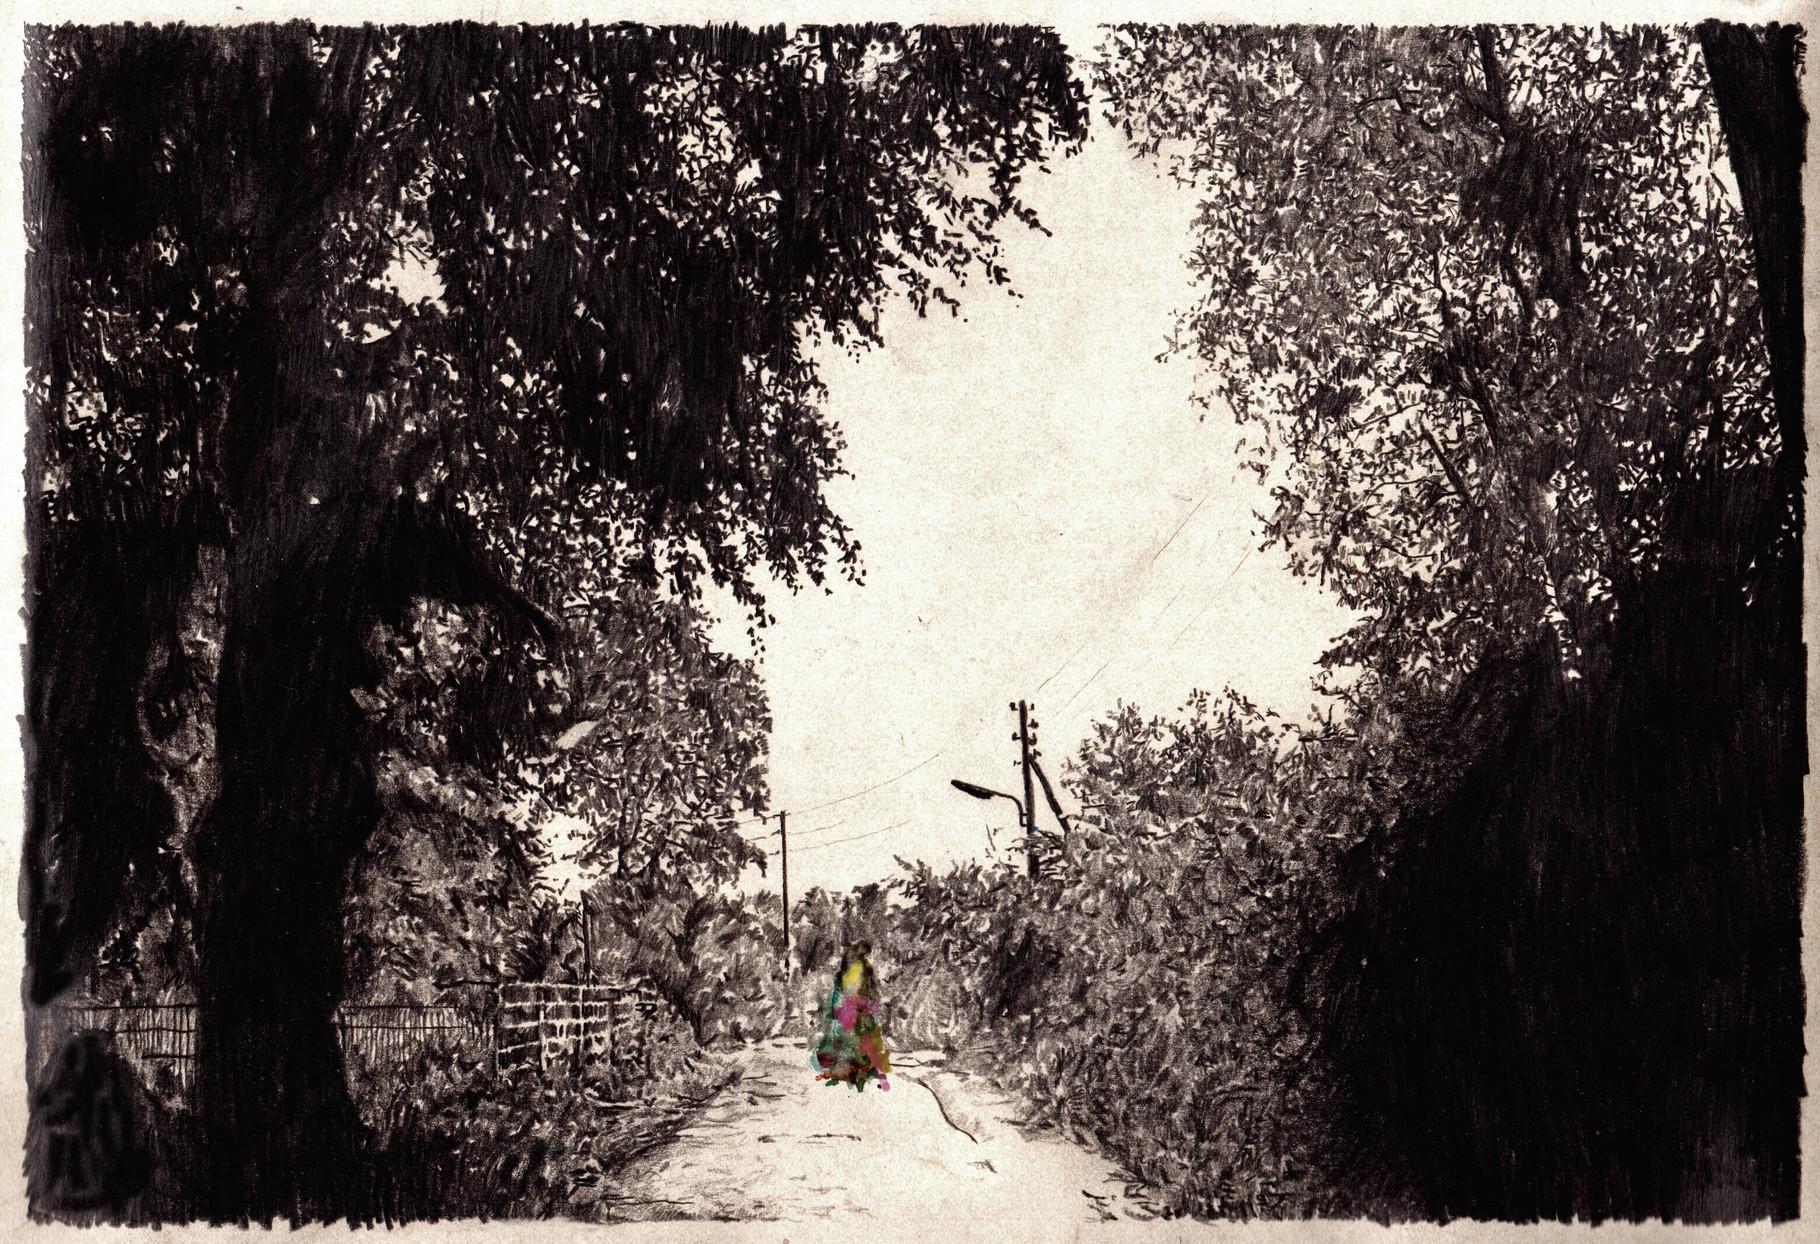 Lost Track II 30x40cm pencil, watercolor 2015